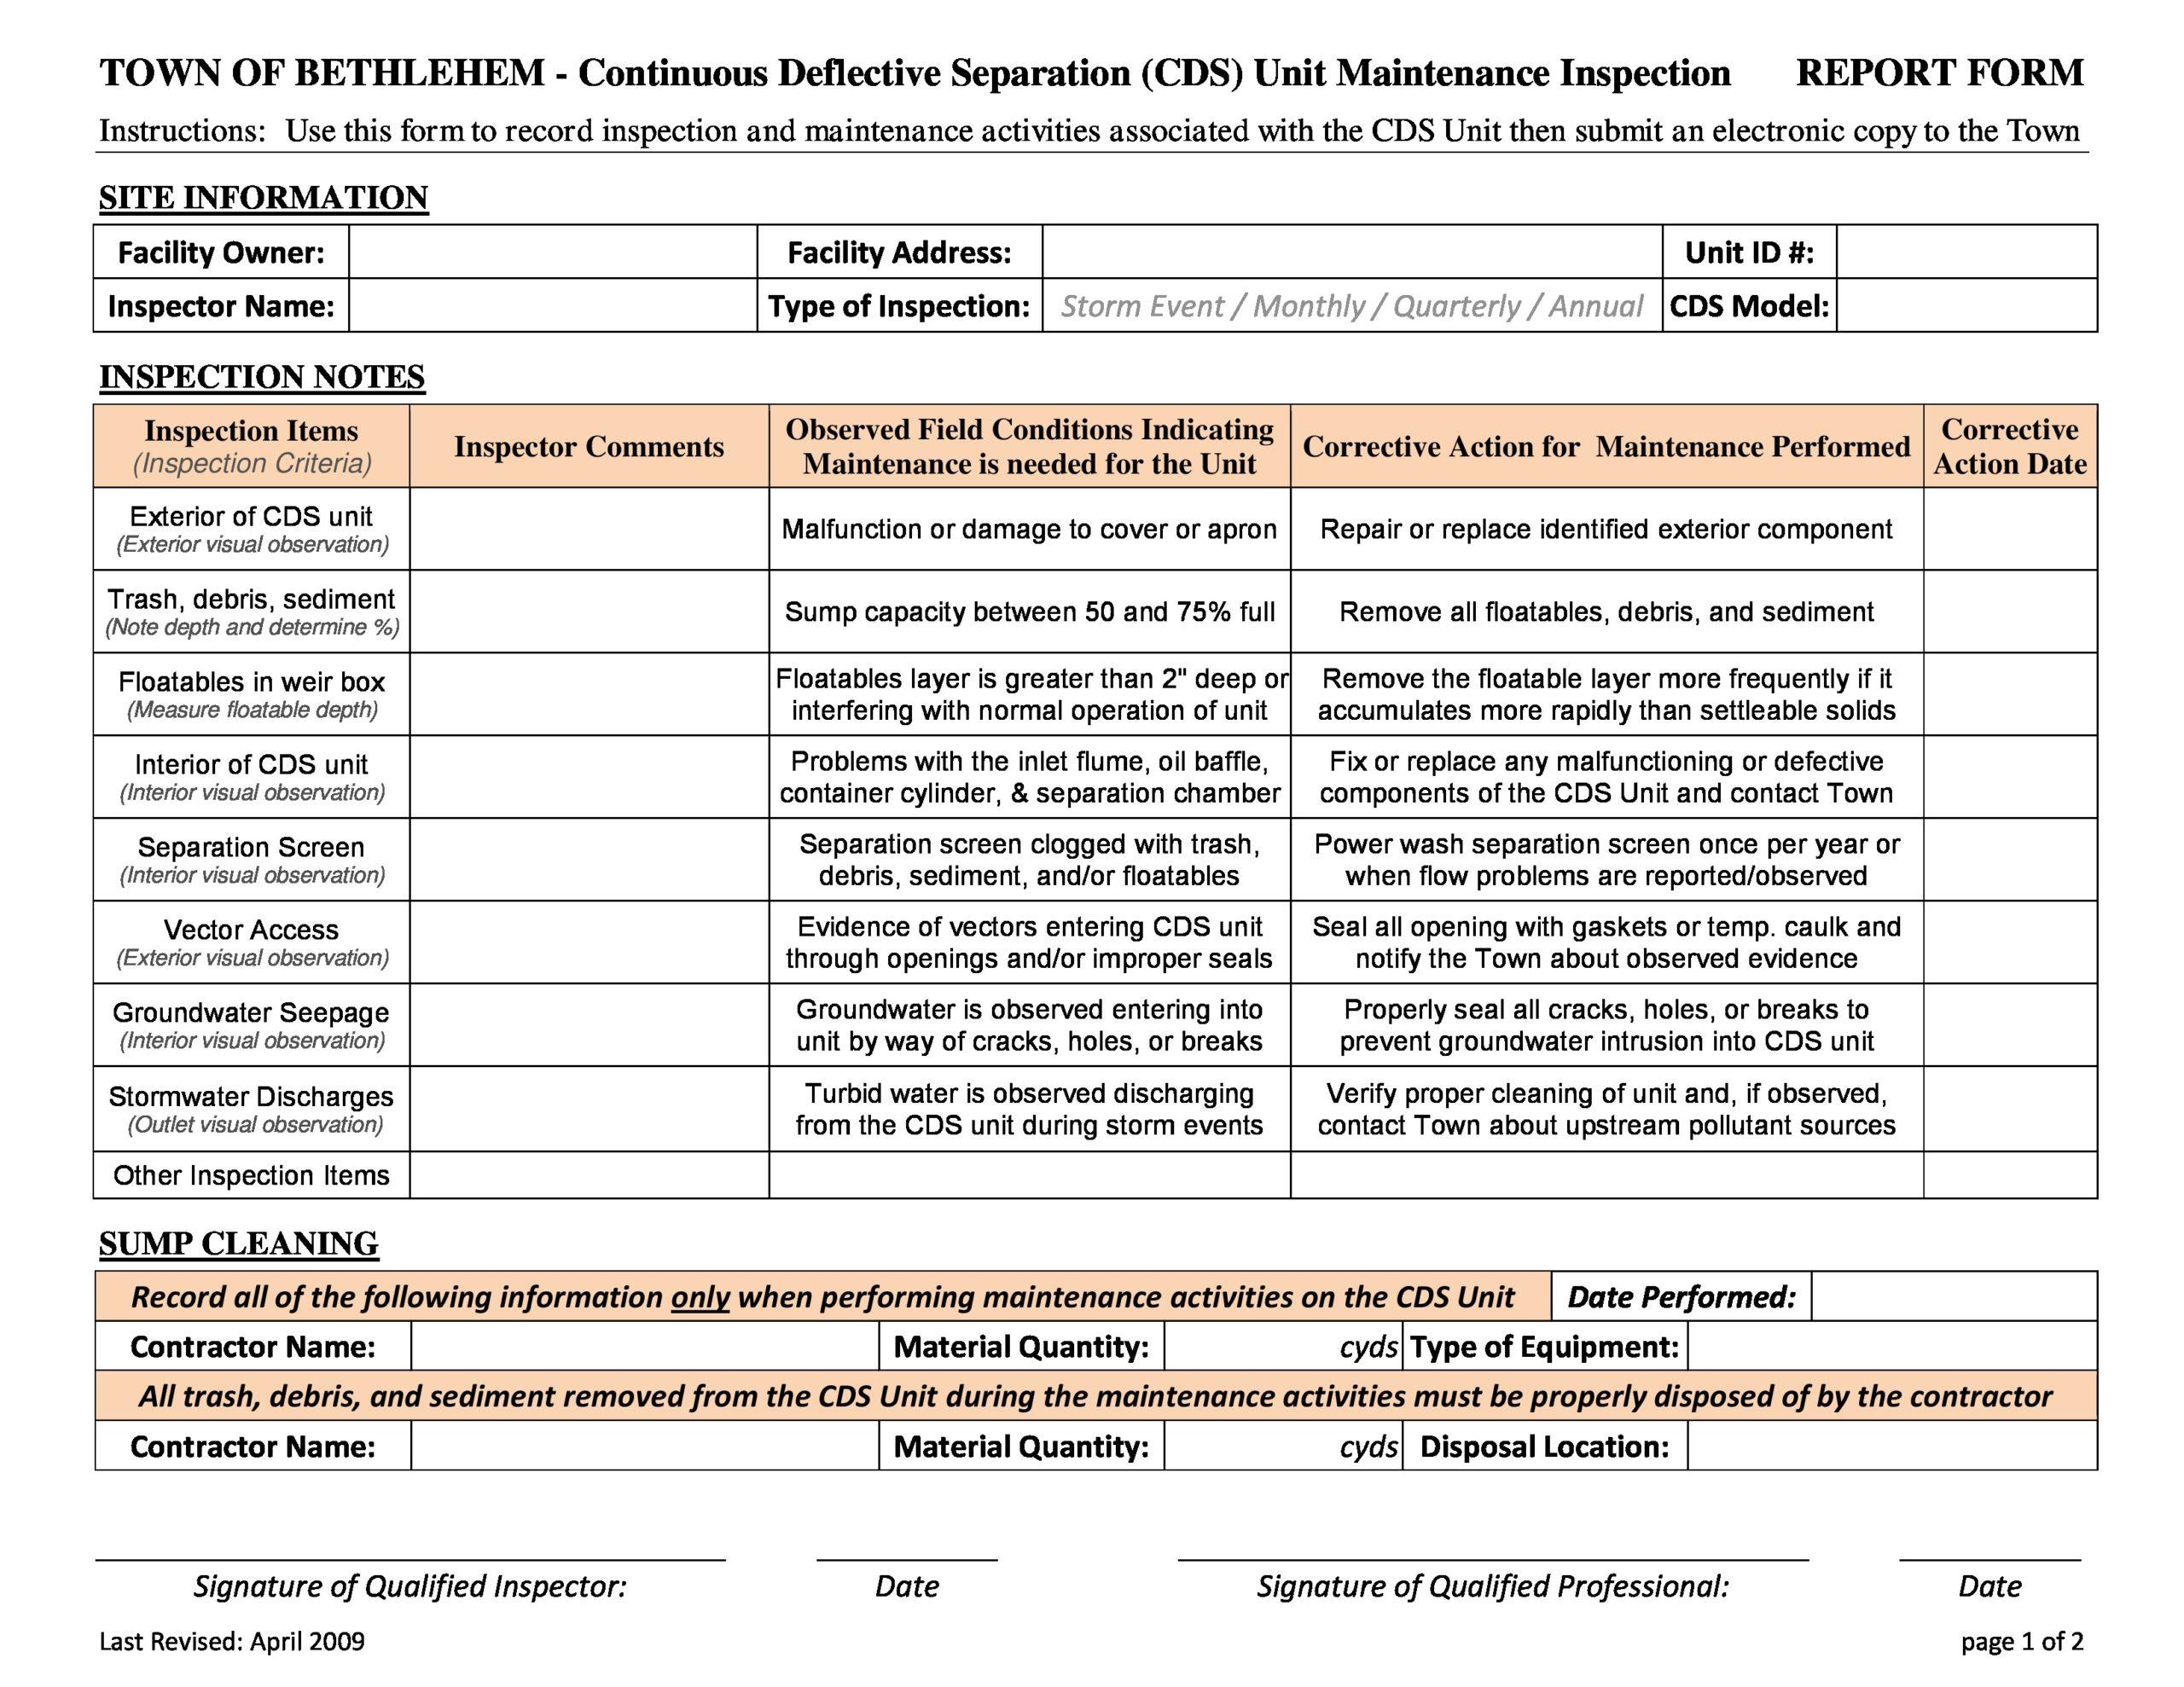 Free maintenance report form 34